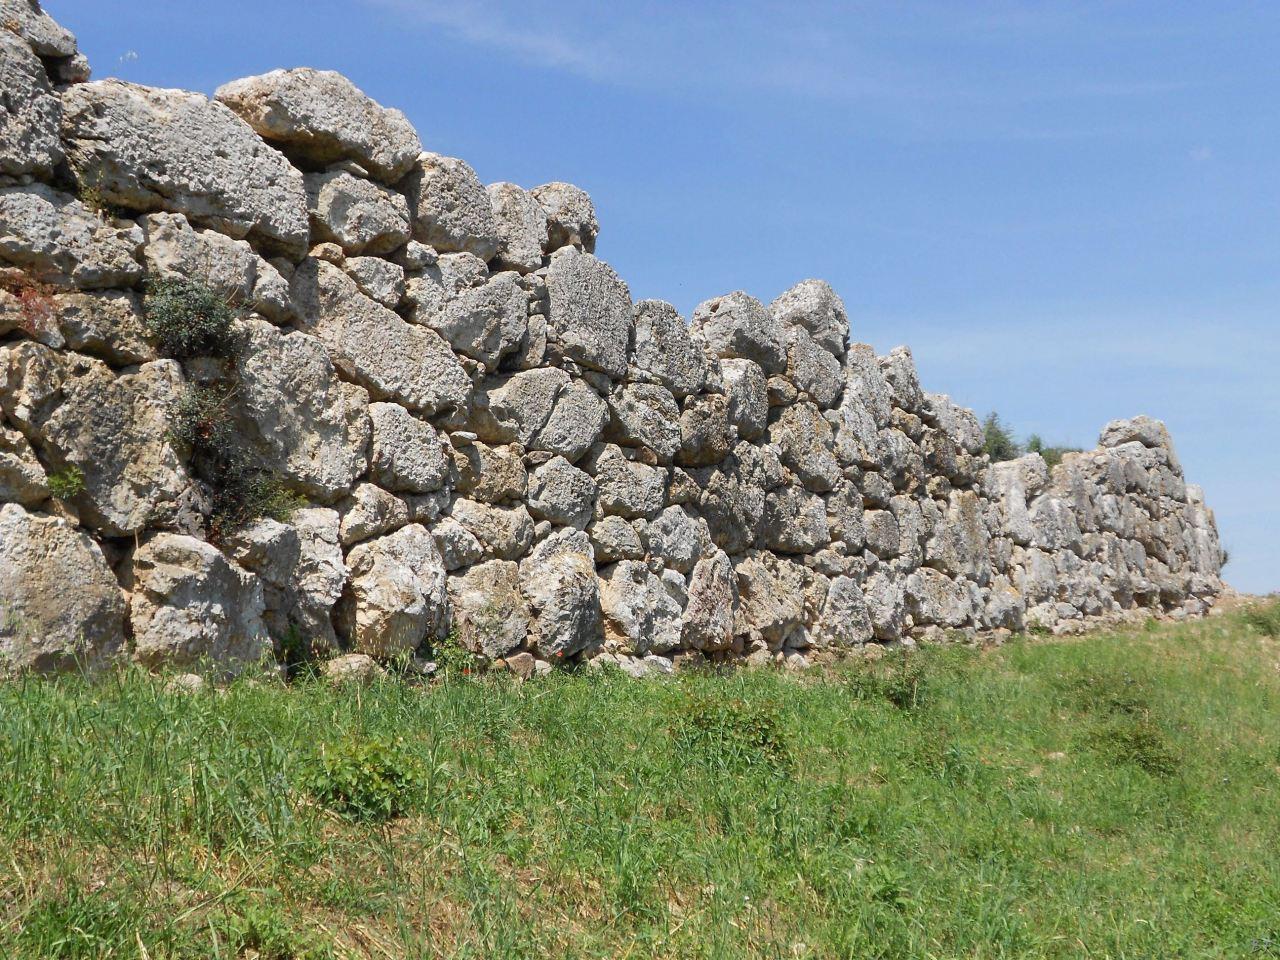 Roselle-Mura-Megalitiche-Roselle-Grosseto-Toscana-Italia-33